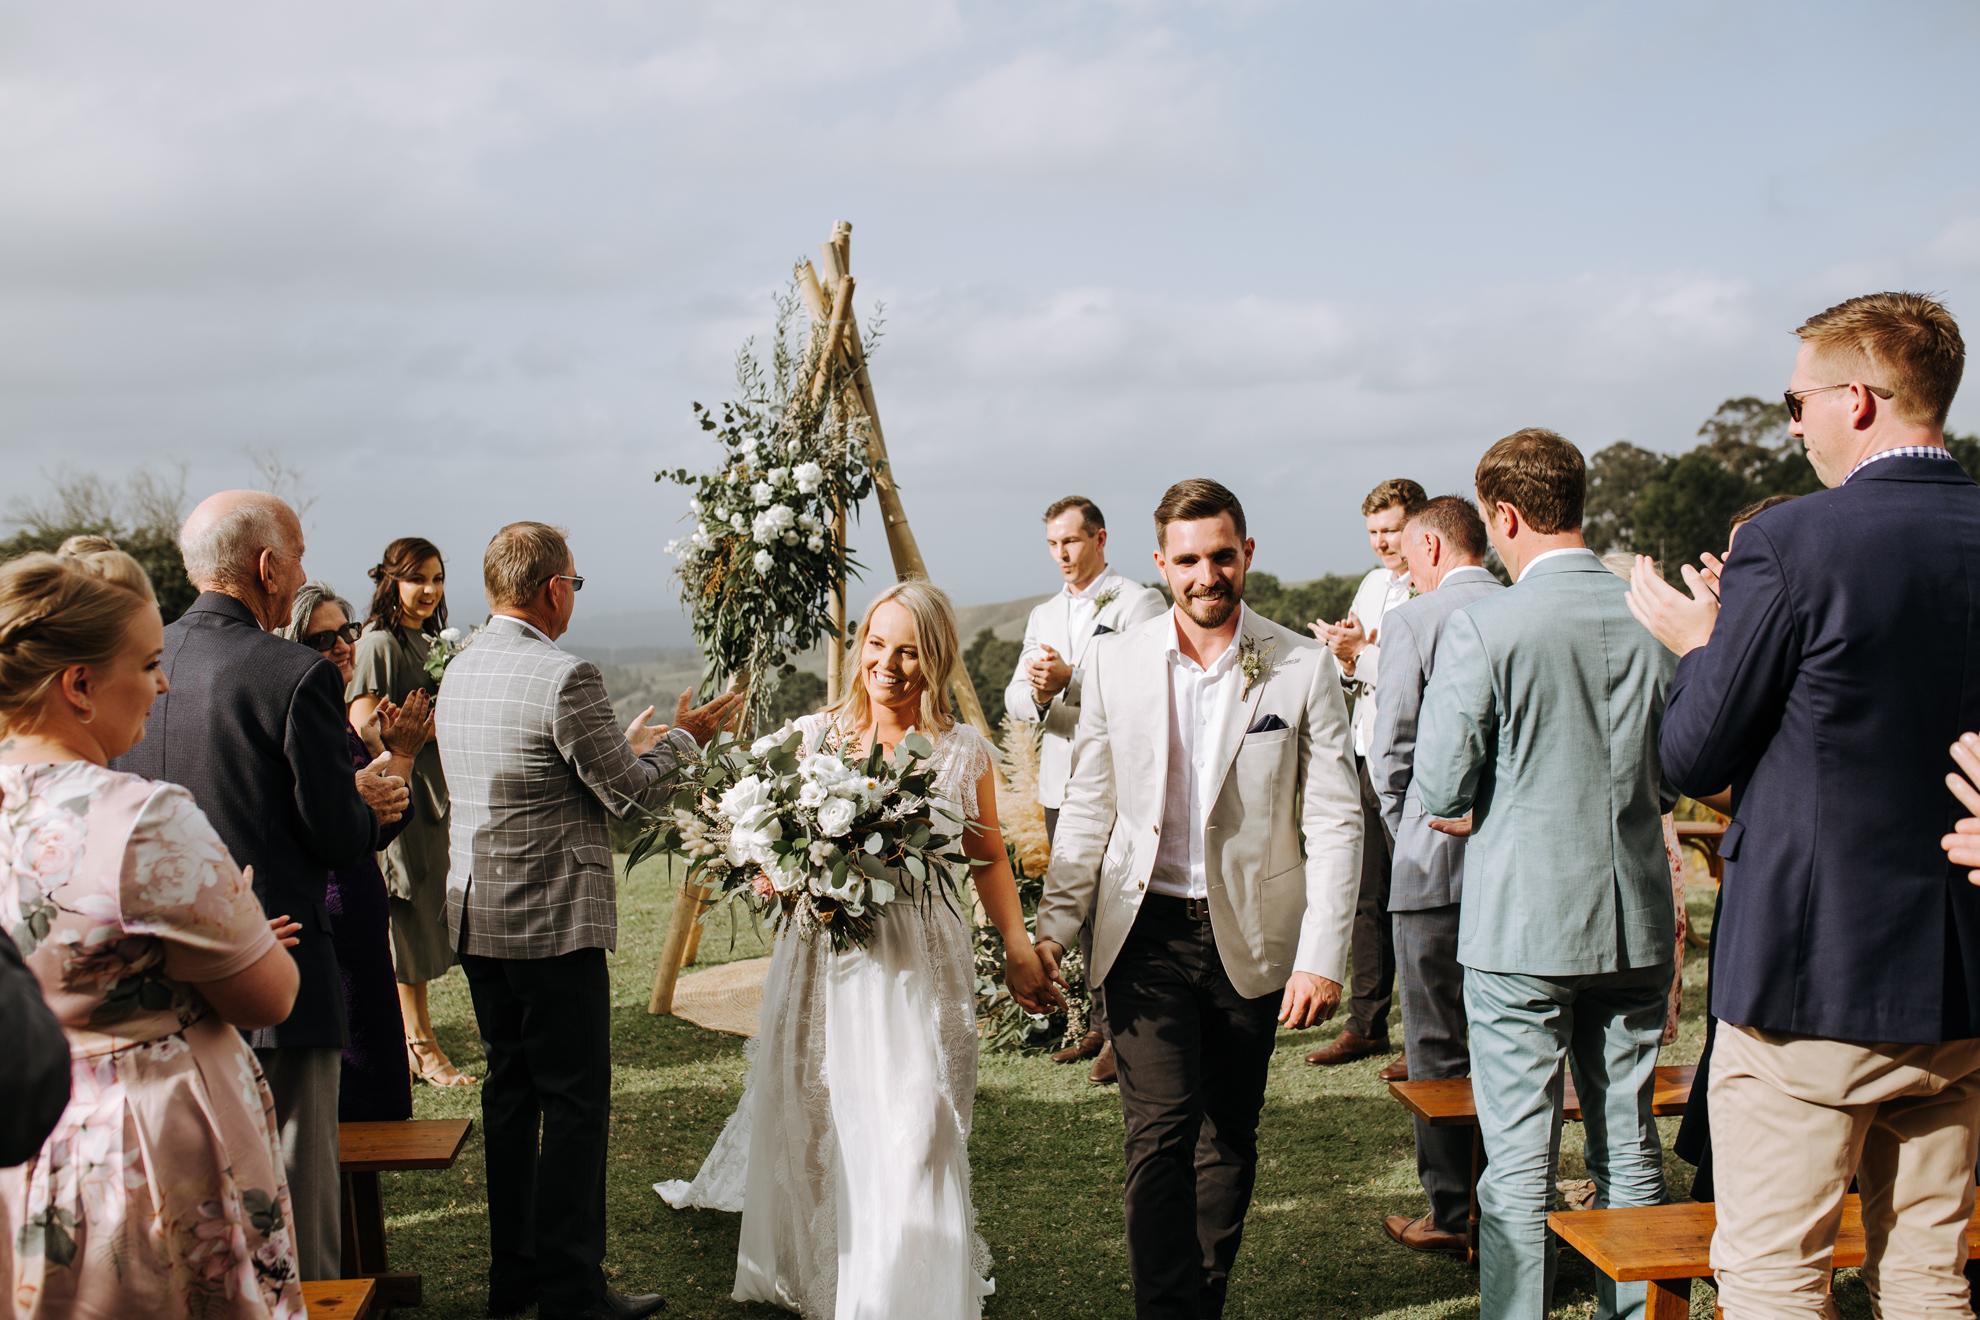 049-Kirby_Lewis_Maleny_Manor_Wedding.jpg